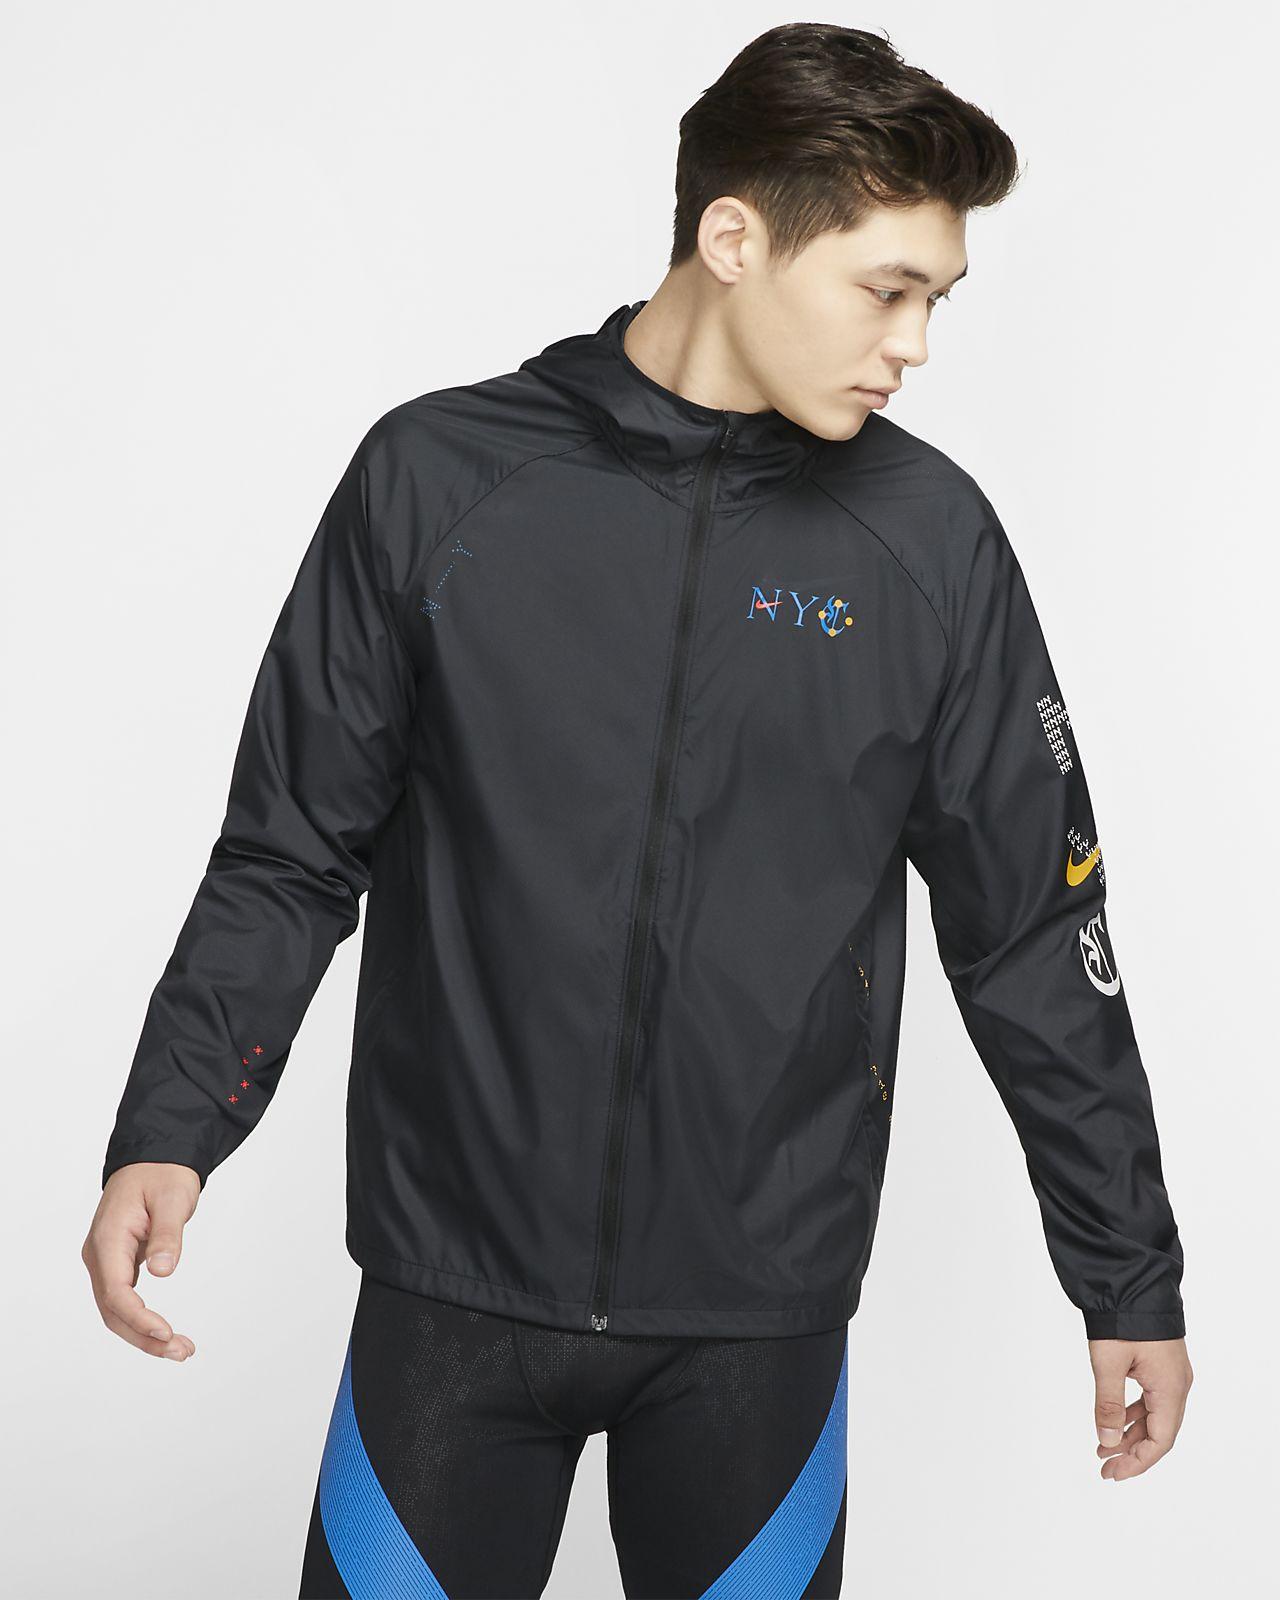 Nike Repel NYC Men's Running Jacket